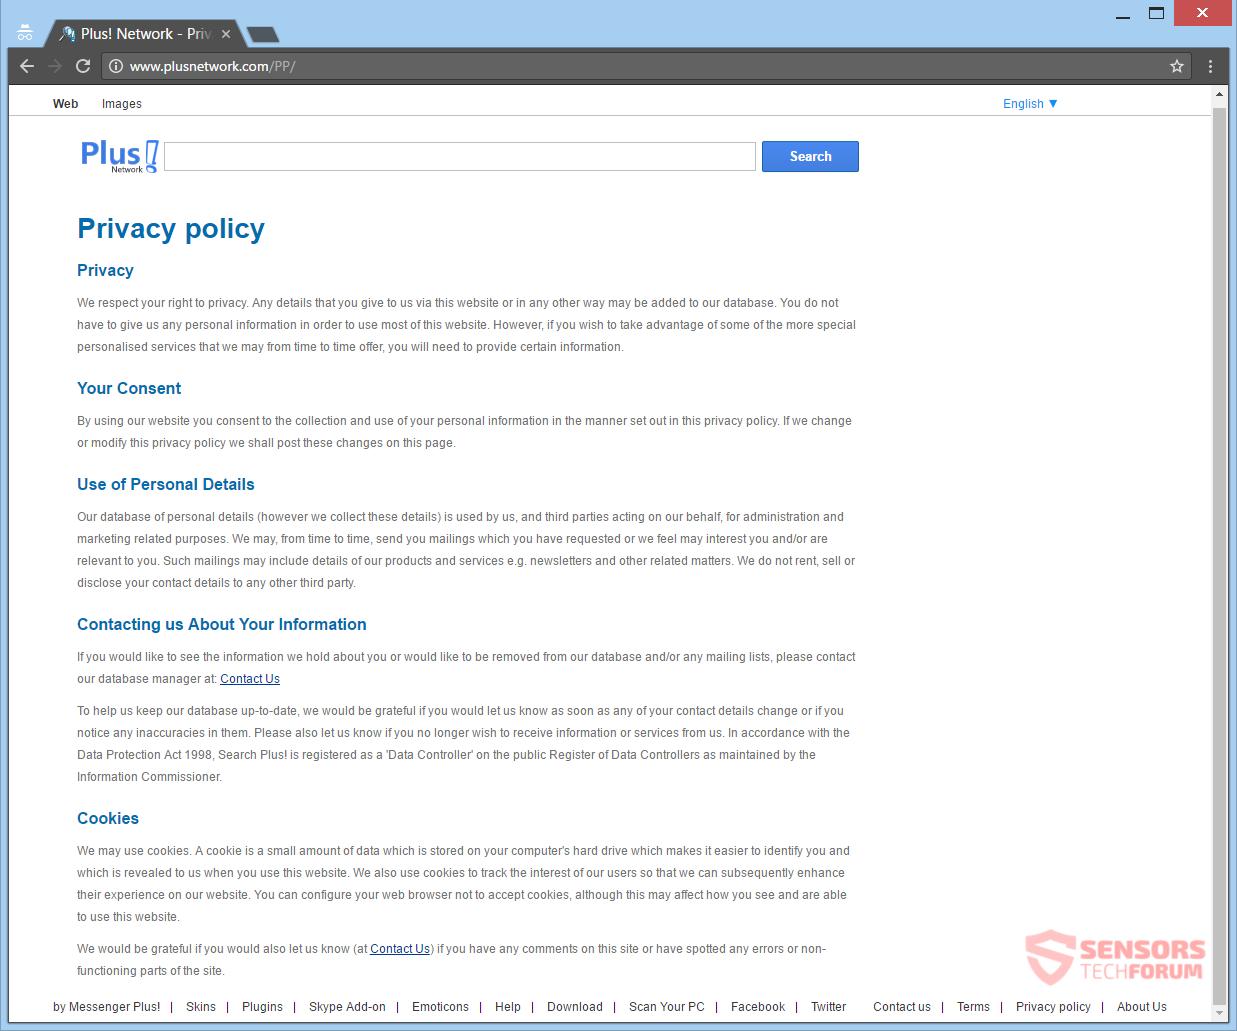 stf-loadstart-net-load-start-browser-hijacker-redirect-plus-network-privacy-policy